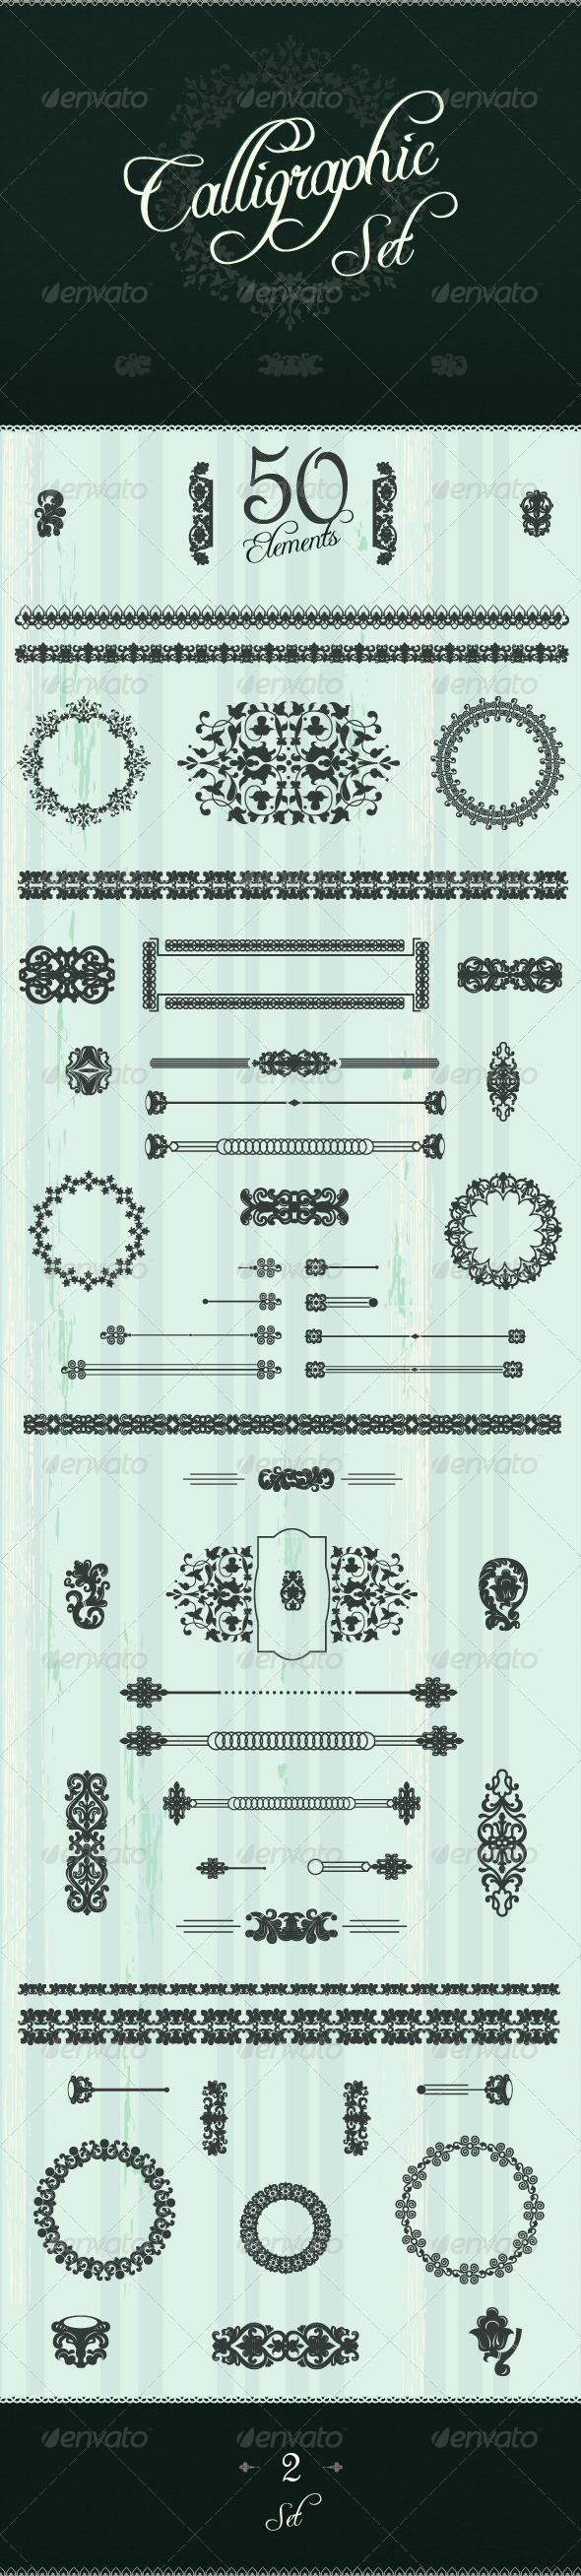 Art Calligraphic Design Set - Flourishes / Swirls Decorative